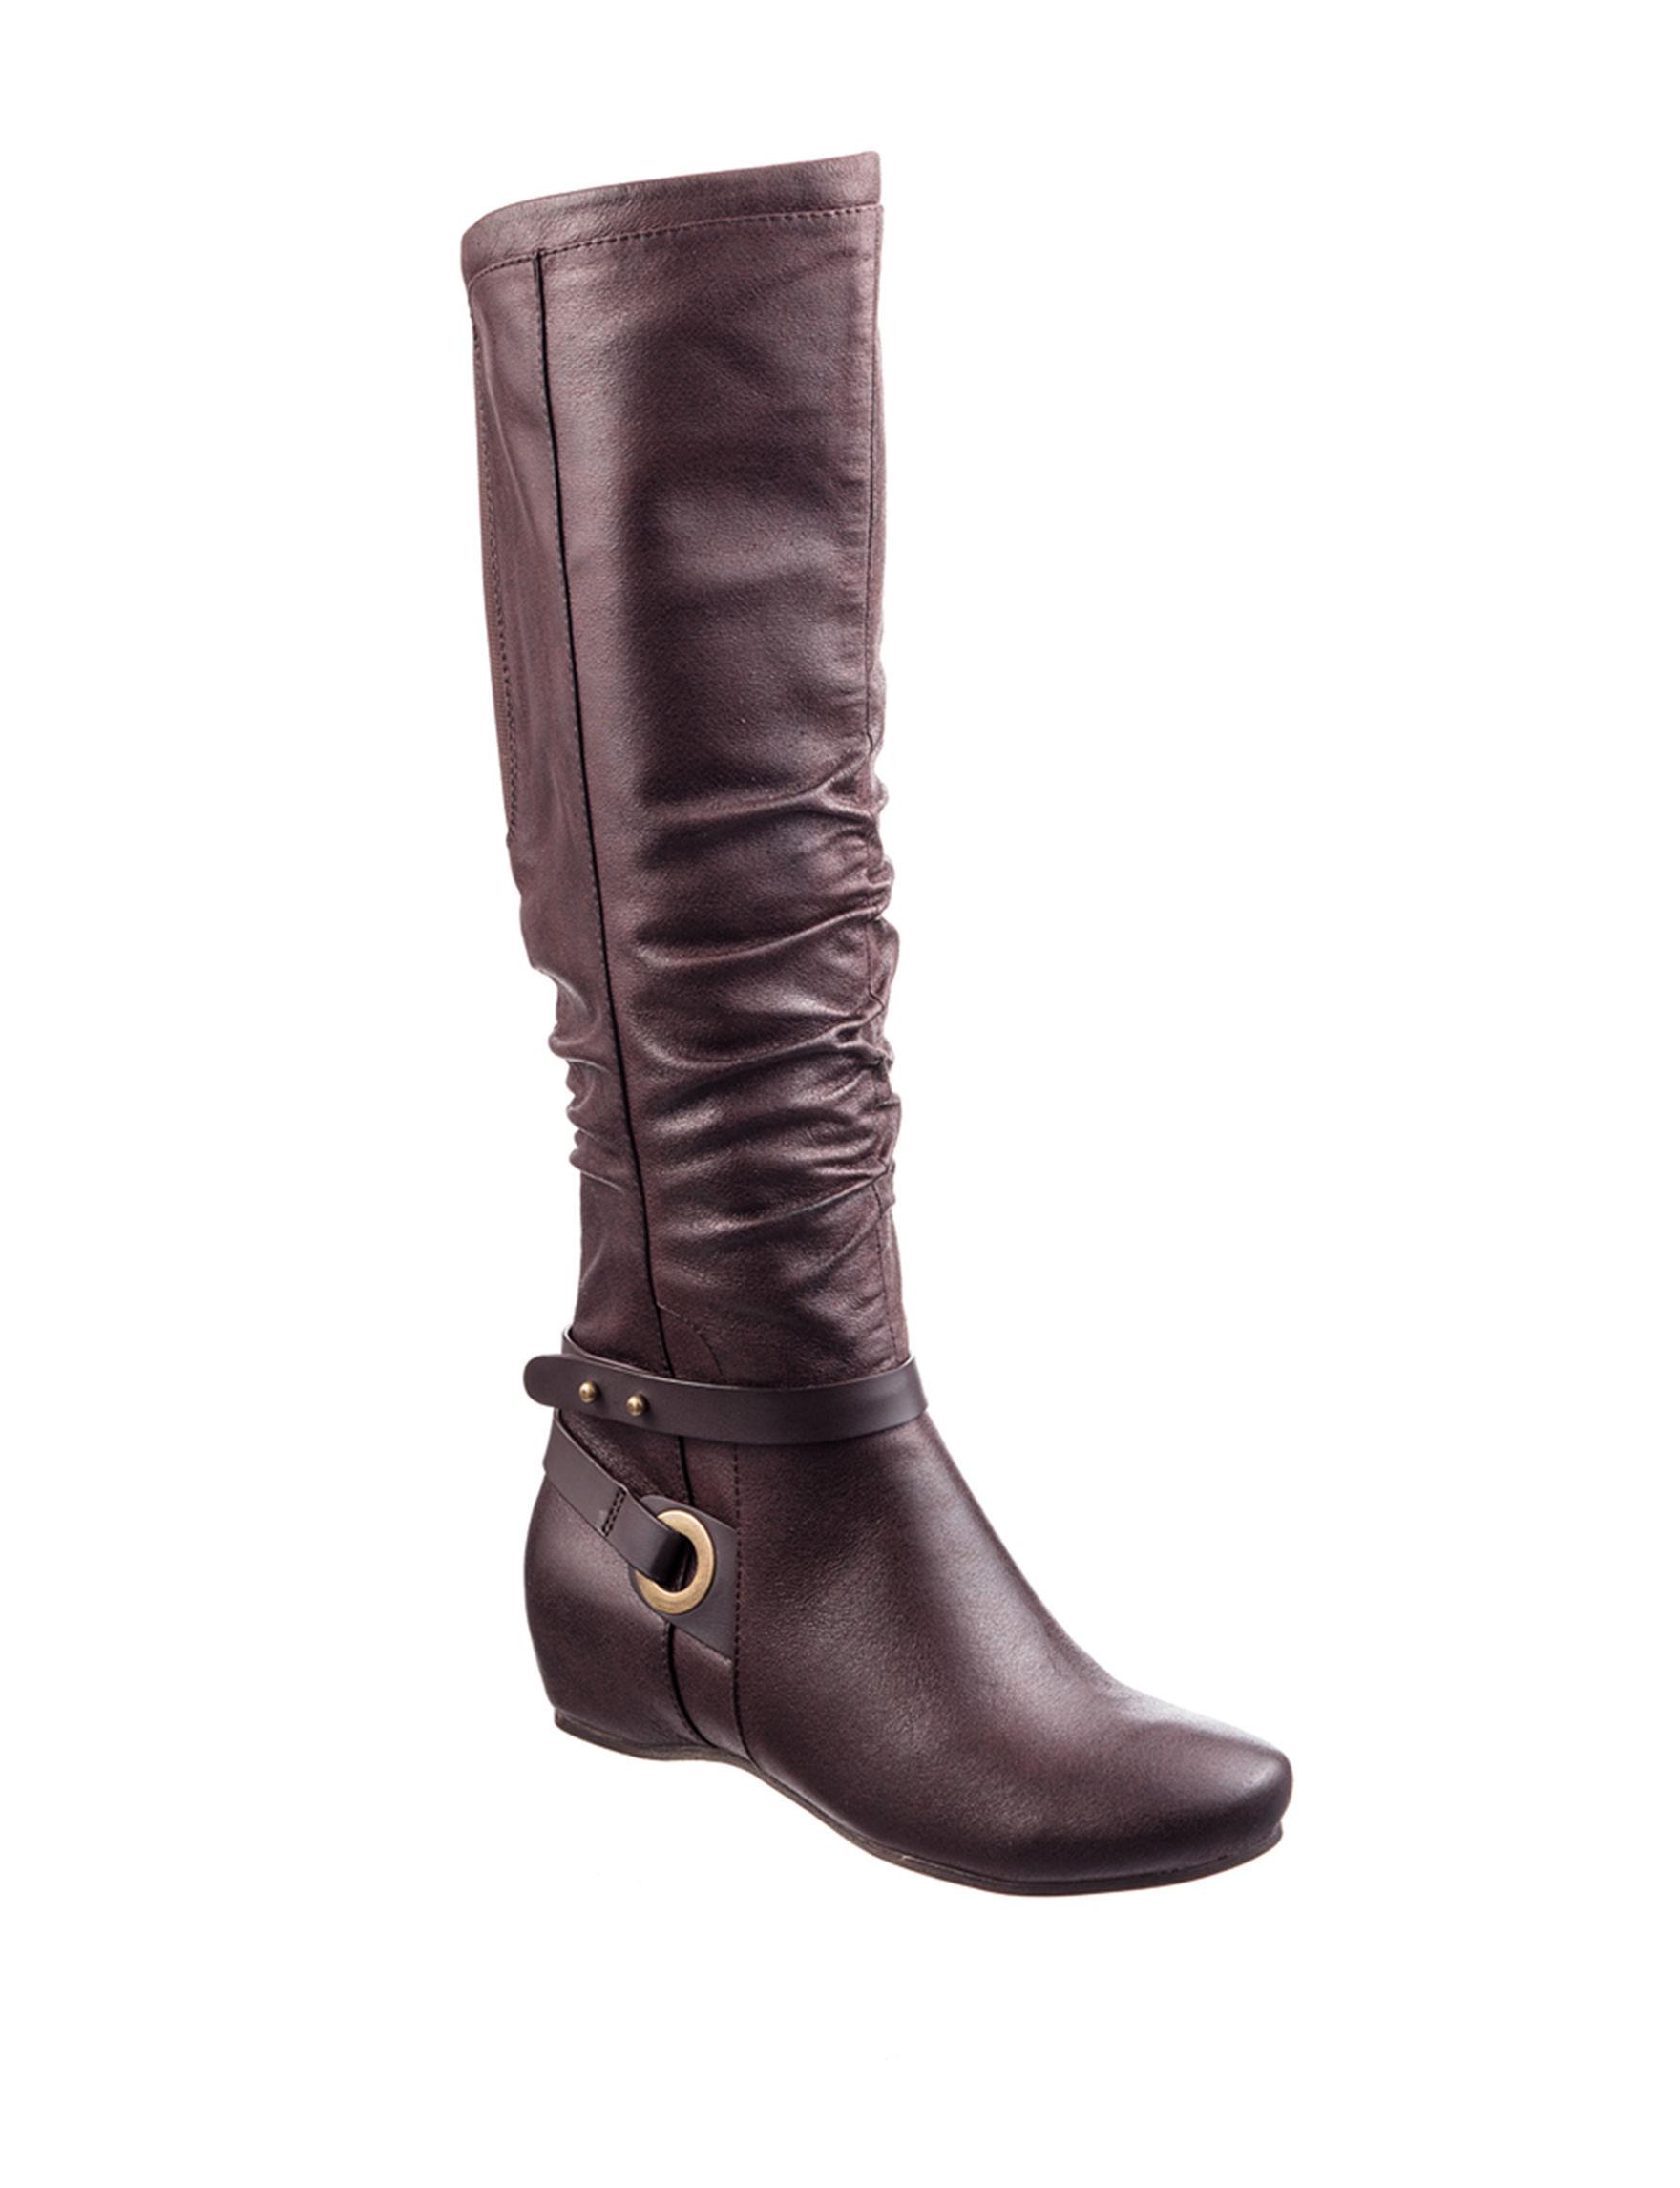 Bare Traps Dark Brown Riding Boots